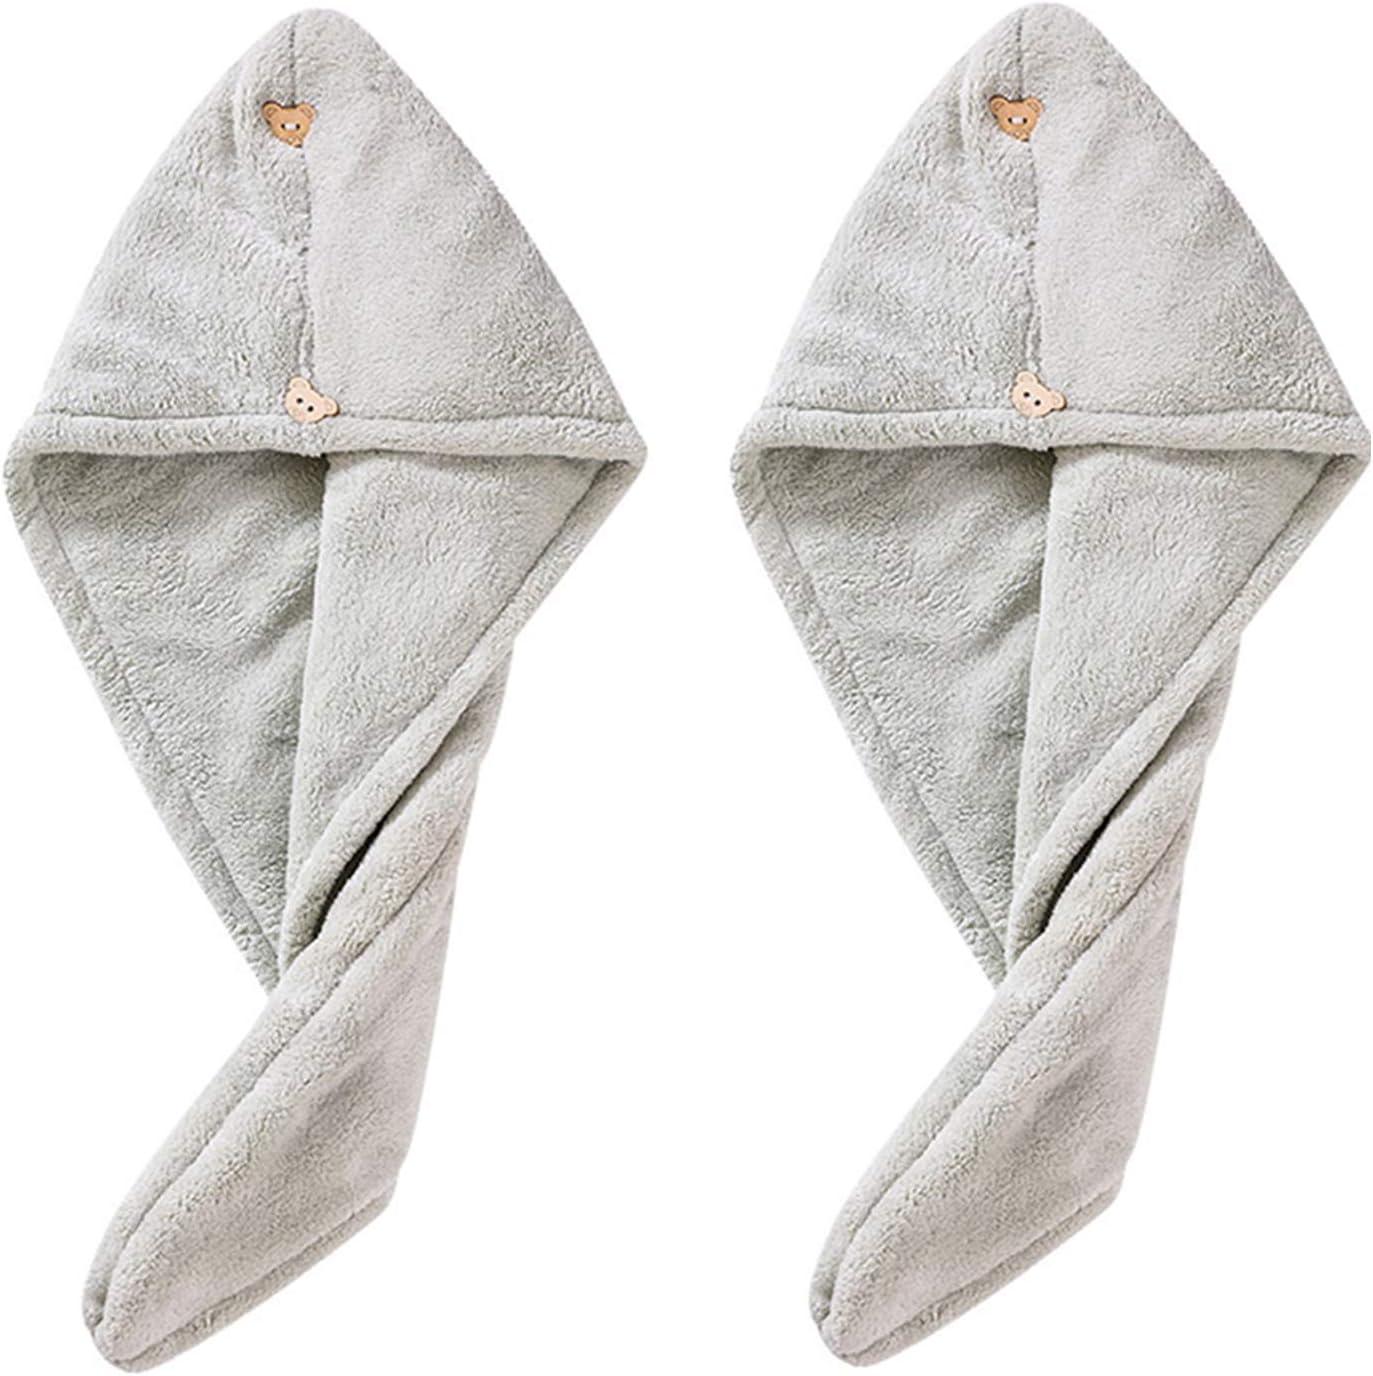 ABBBHHJL Dry Hair Cap for Pack 2 Hat Max 83% OFF Towel [Alternative dealer] Women